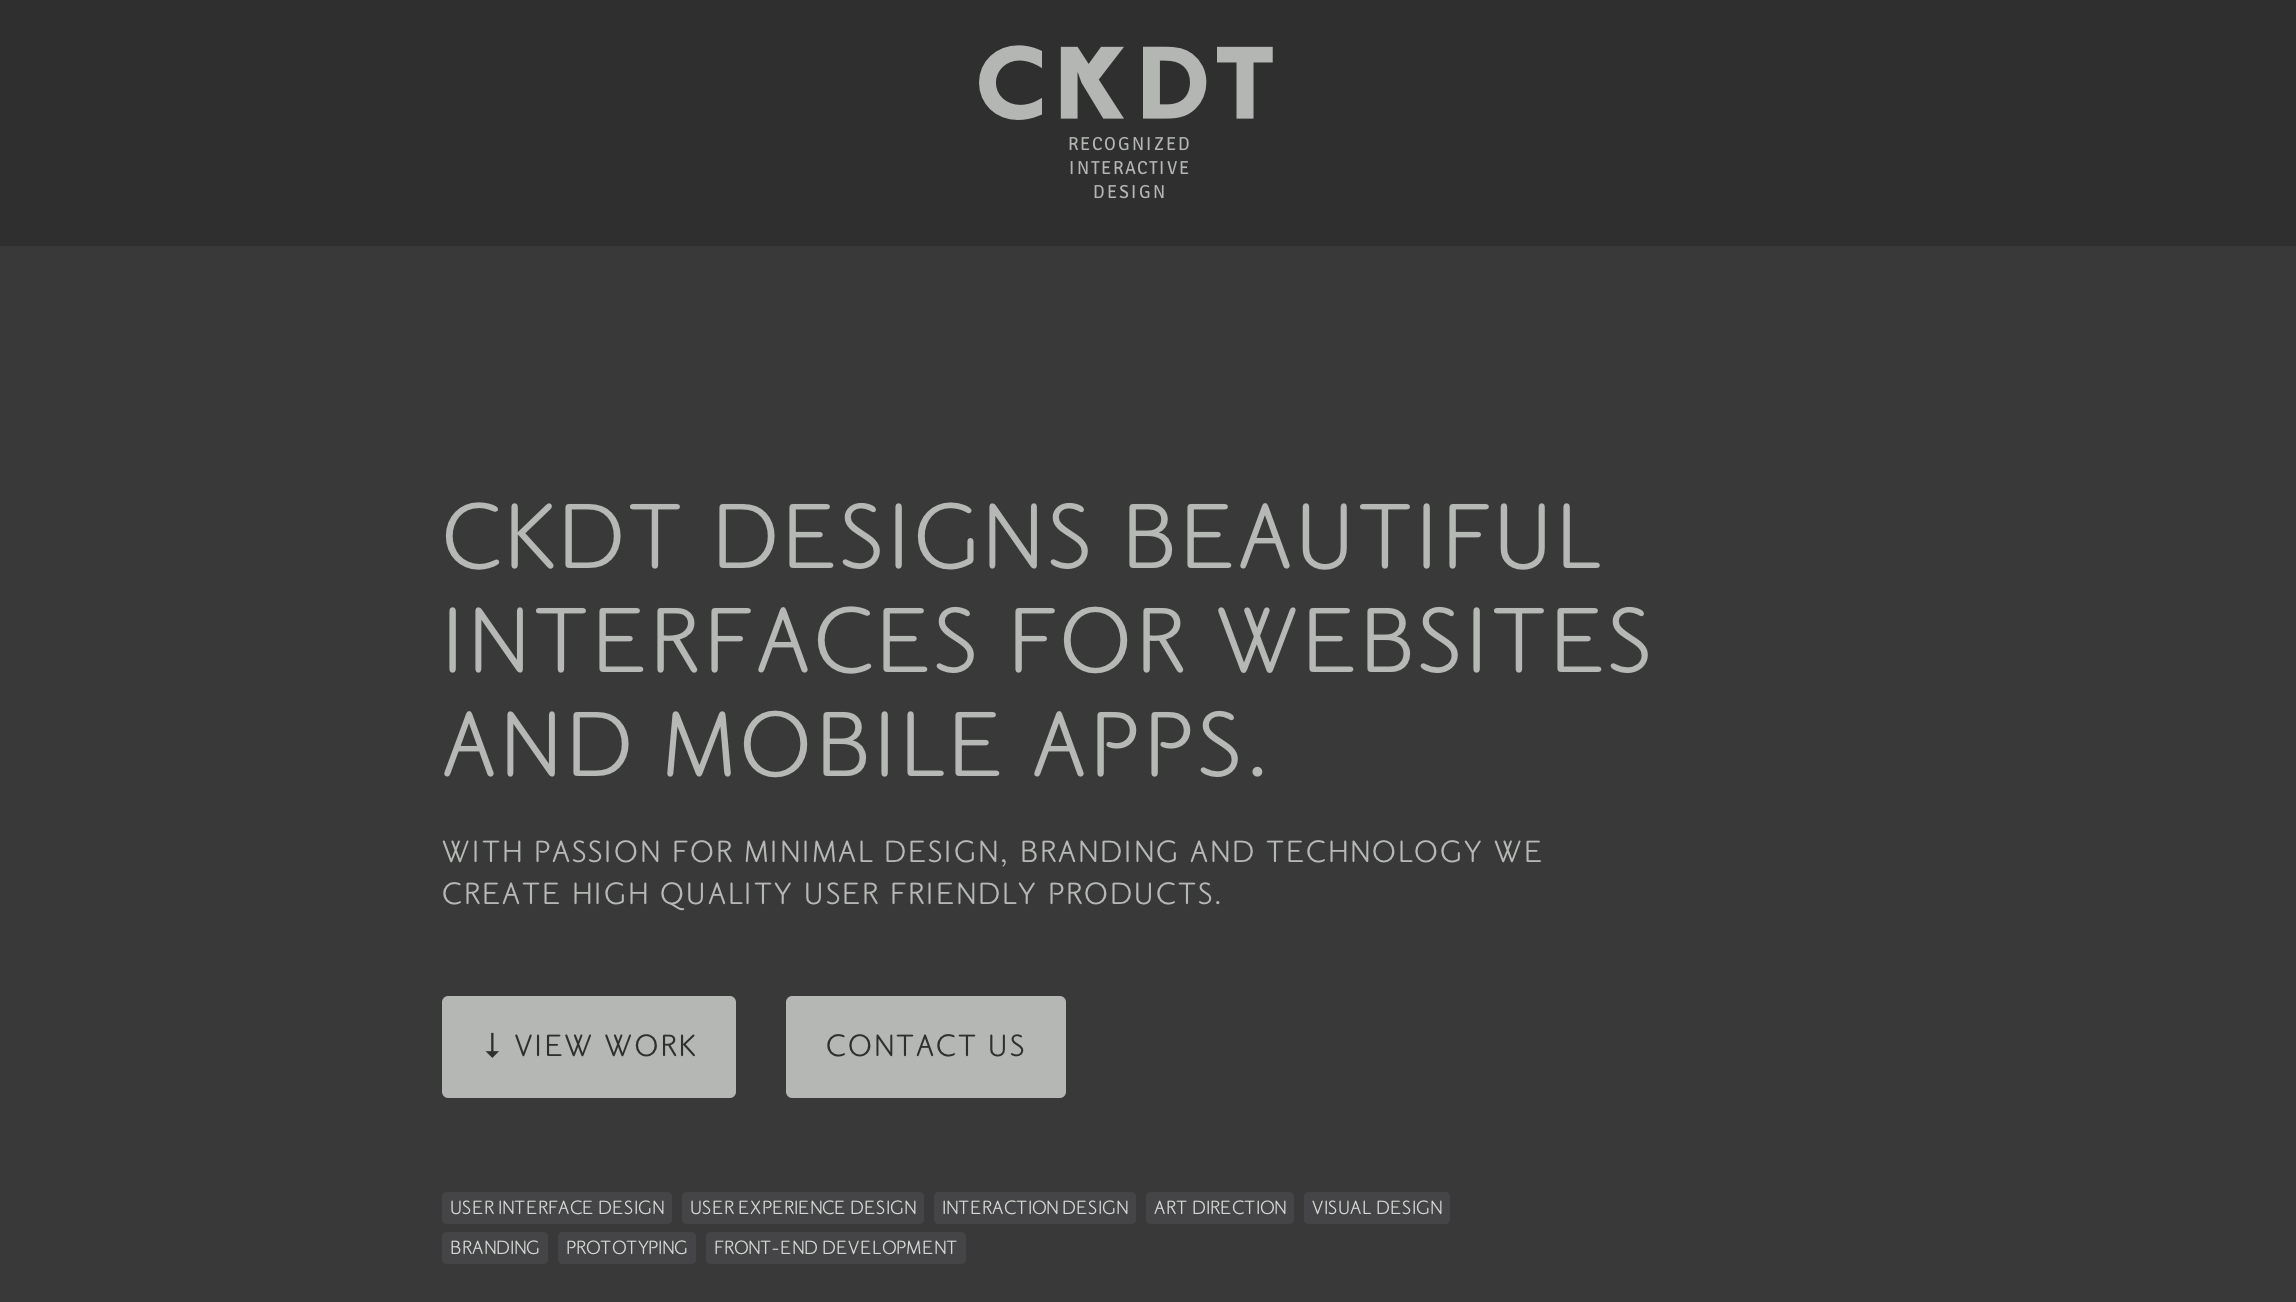 CKDT Website Screenshot